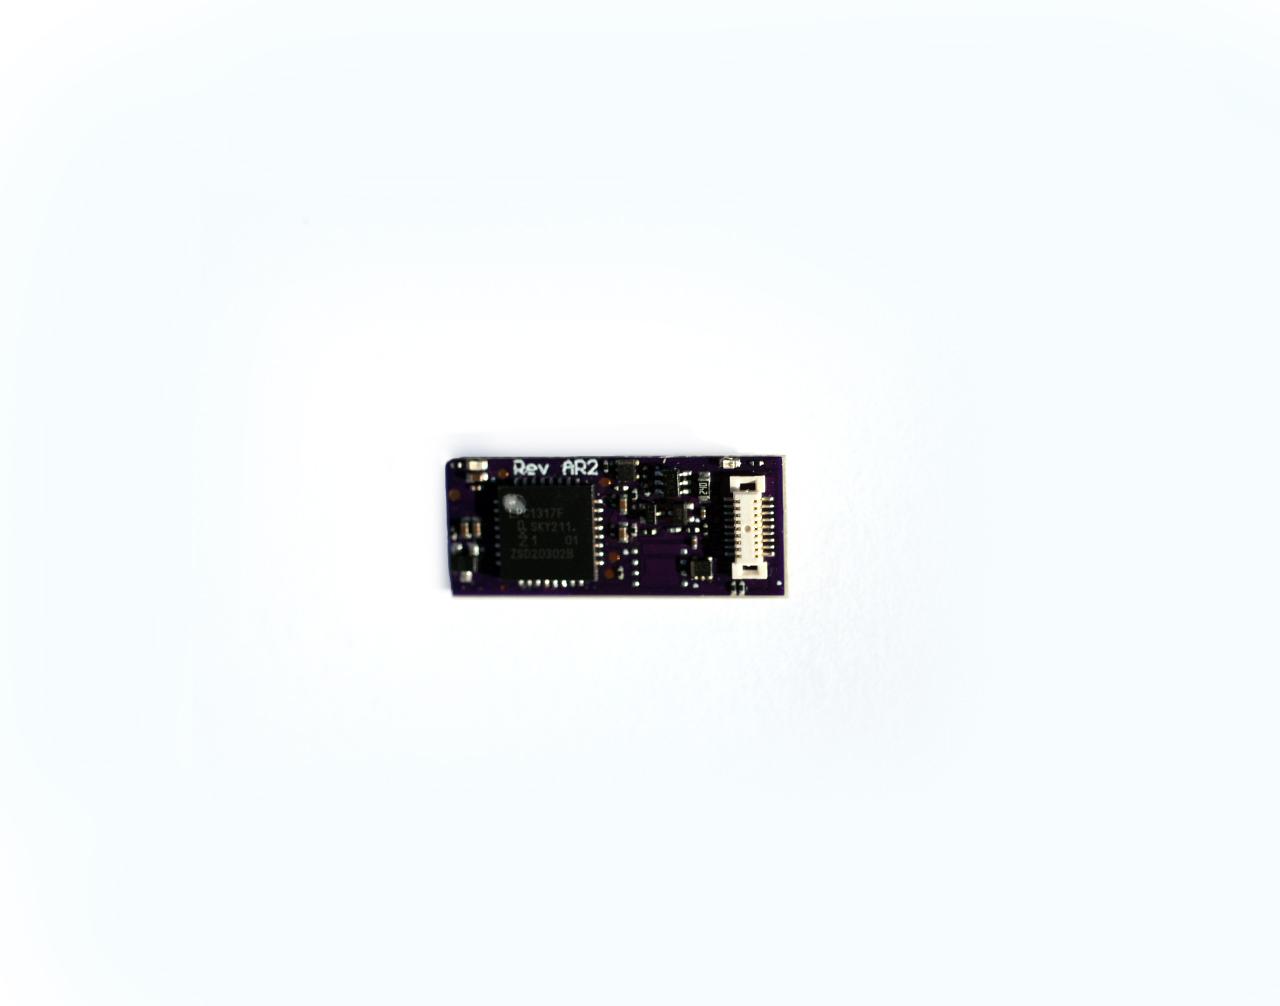 Soundtraxx 884010 -  HO & N Scale TSU-N18 Tsunami2 Sound Decoder for Steam-2